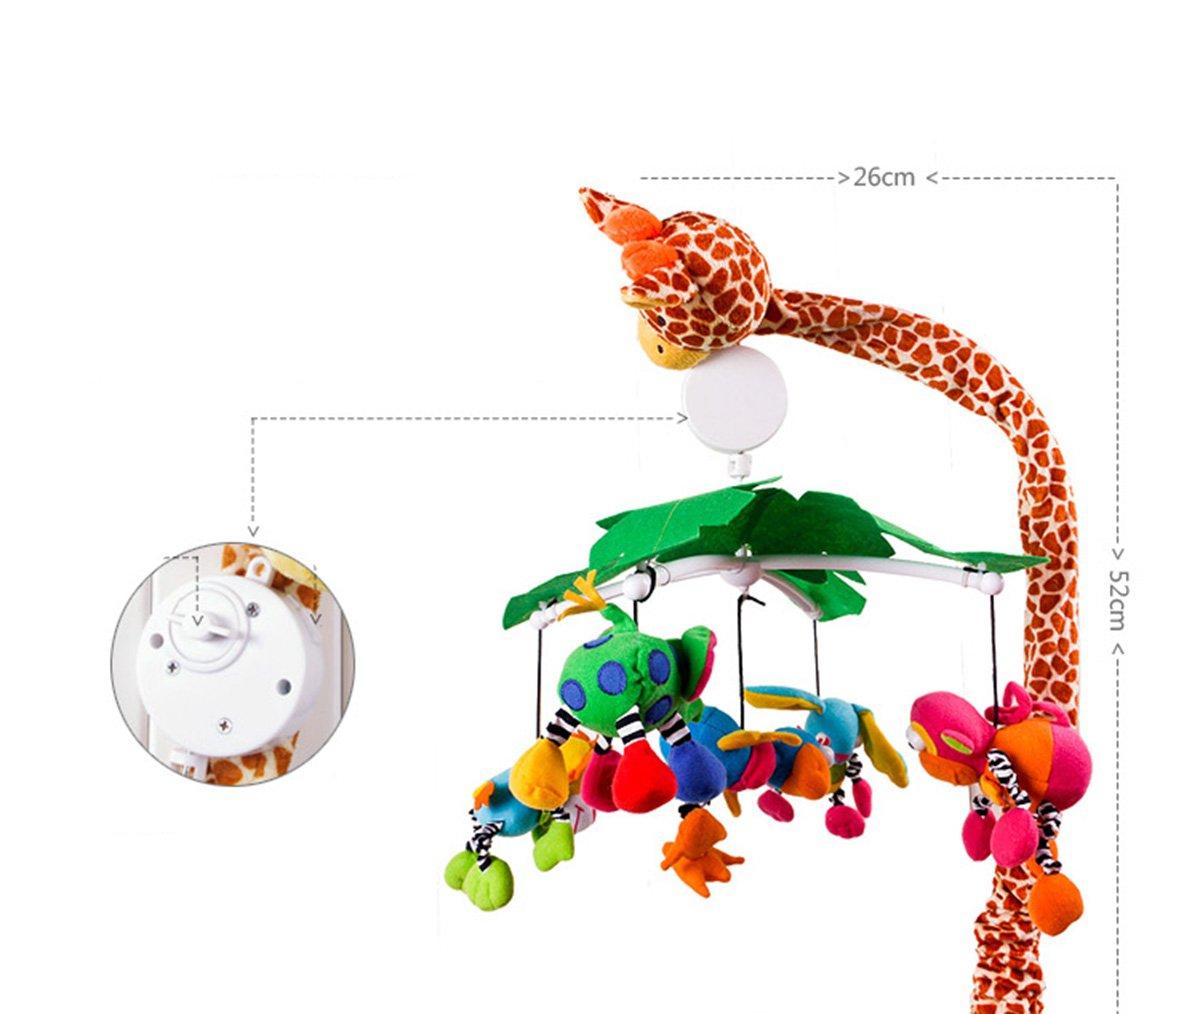 Bebé calmante Musical Cuna móvil, Sika Deer: Amazon.es: Bebé